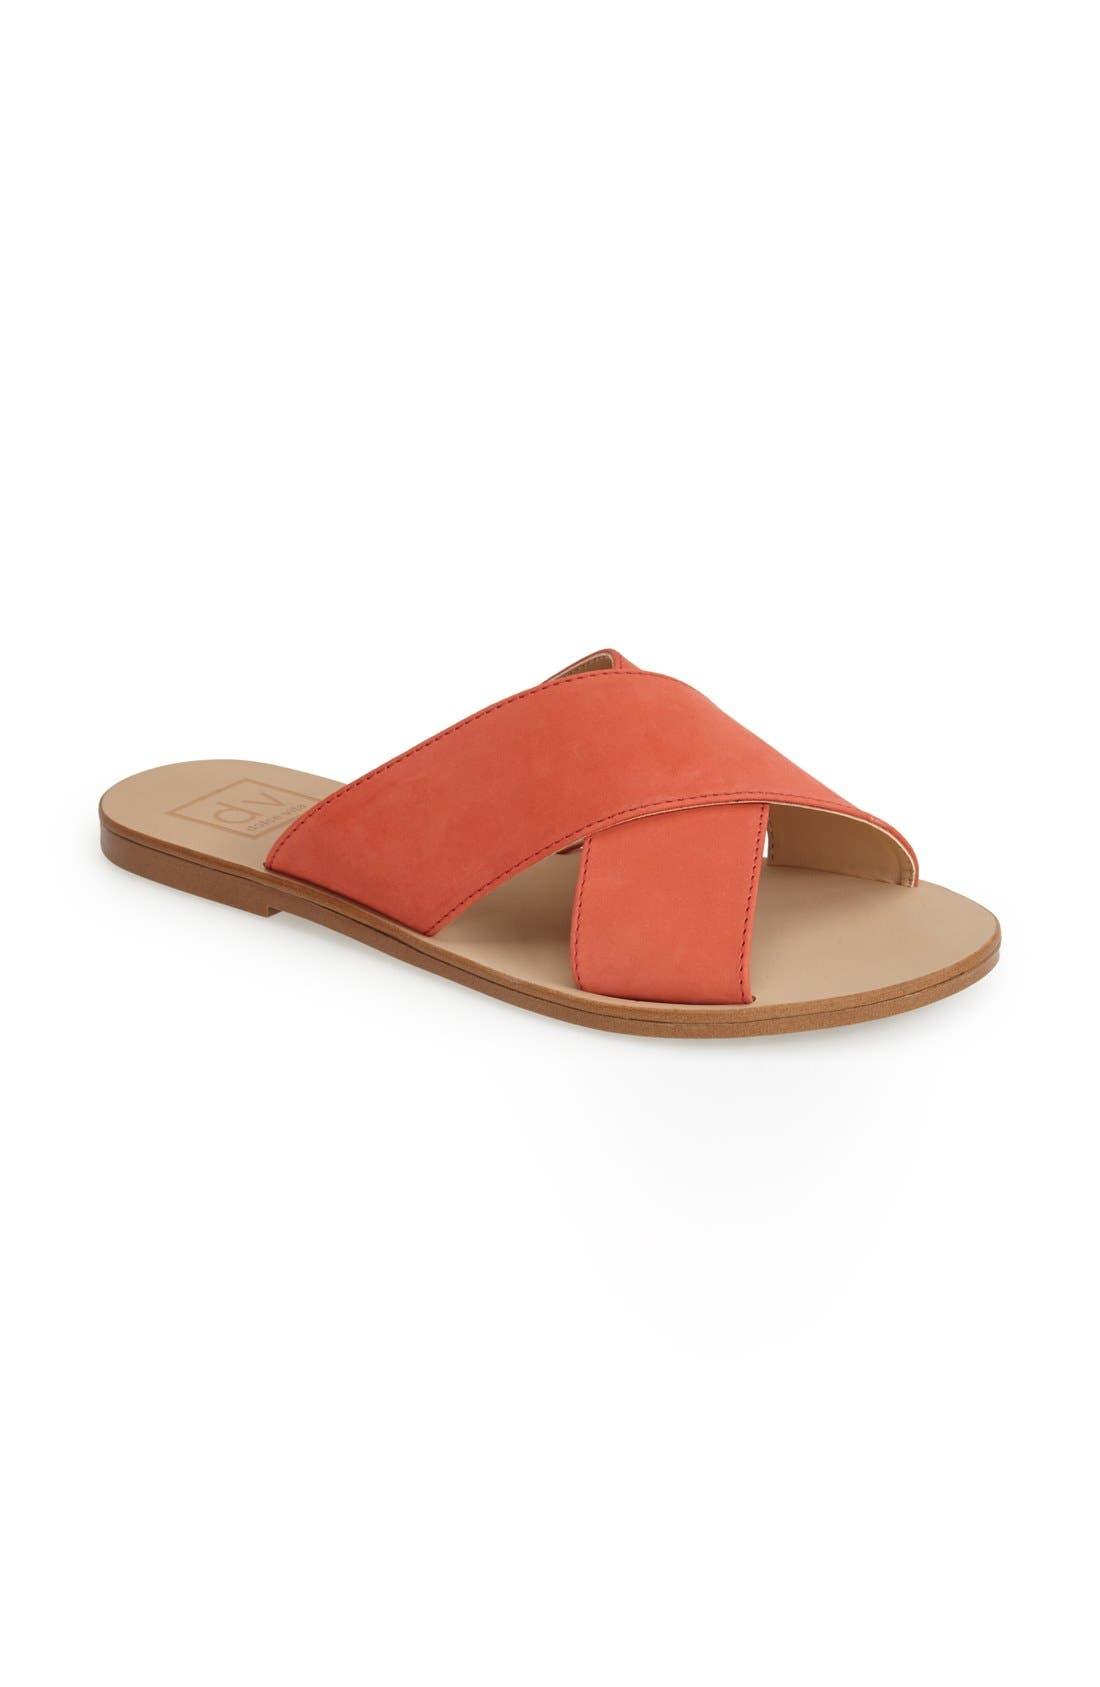 Alternate Image 1 Selected - DV by Dolce Vita 'Orra' Crossover Strap Flat Sandal (Women)